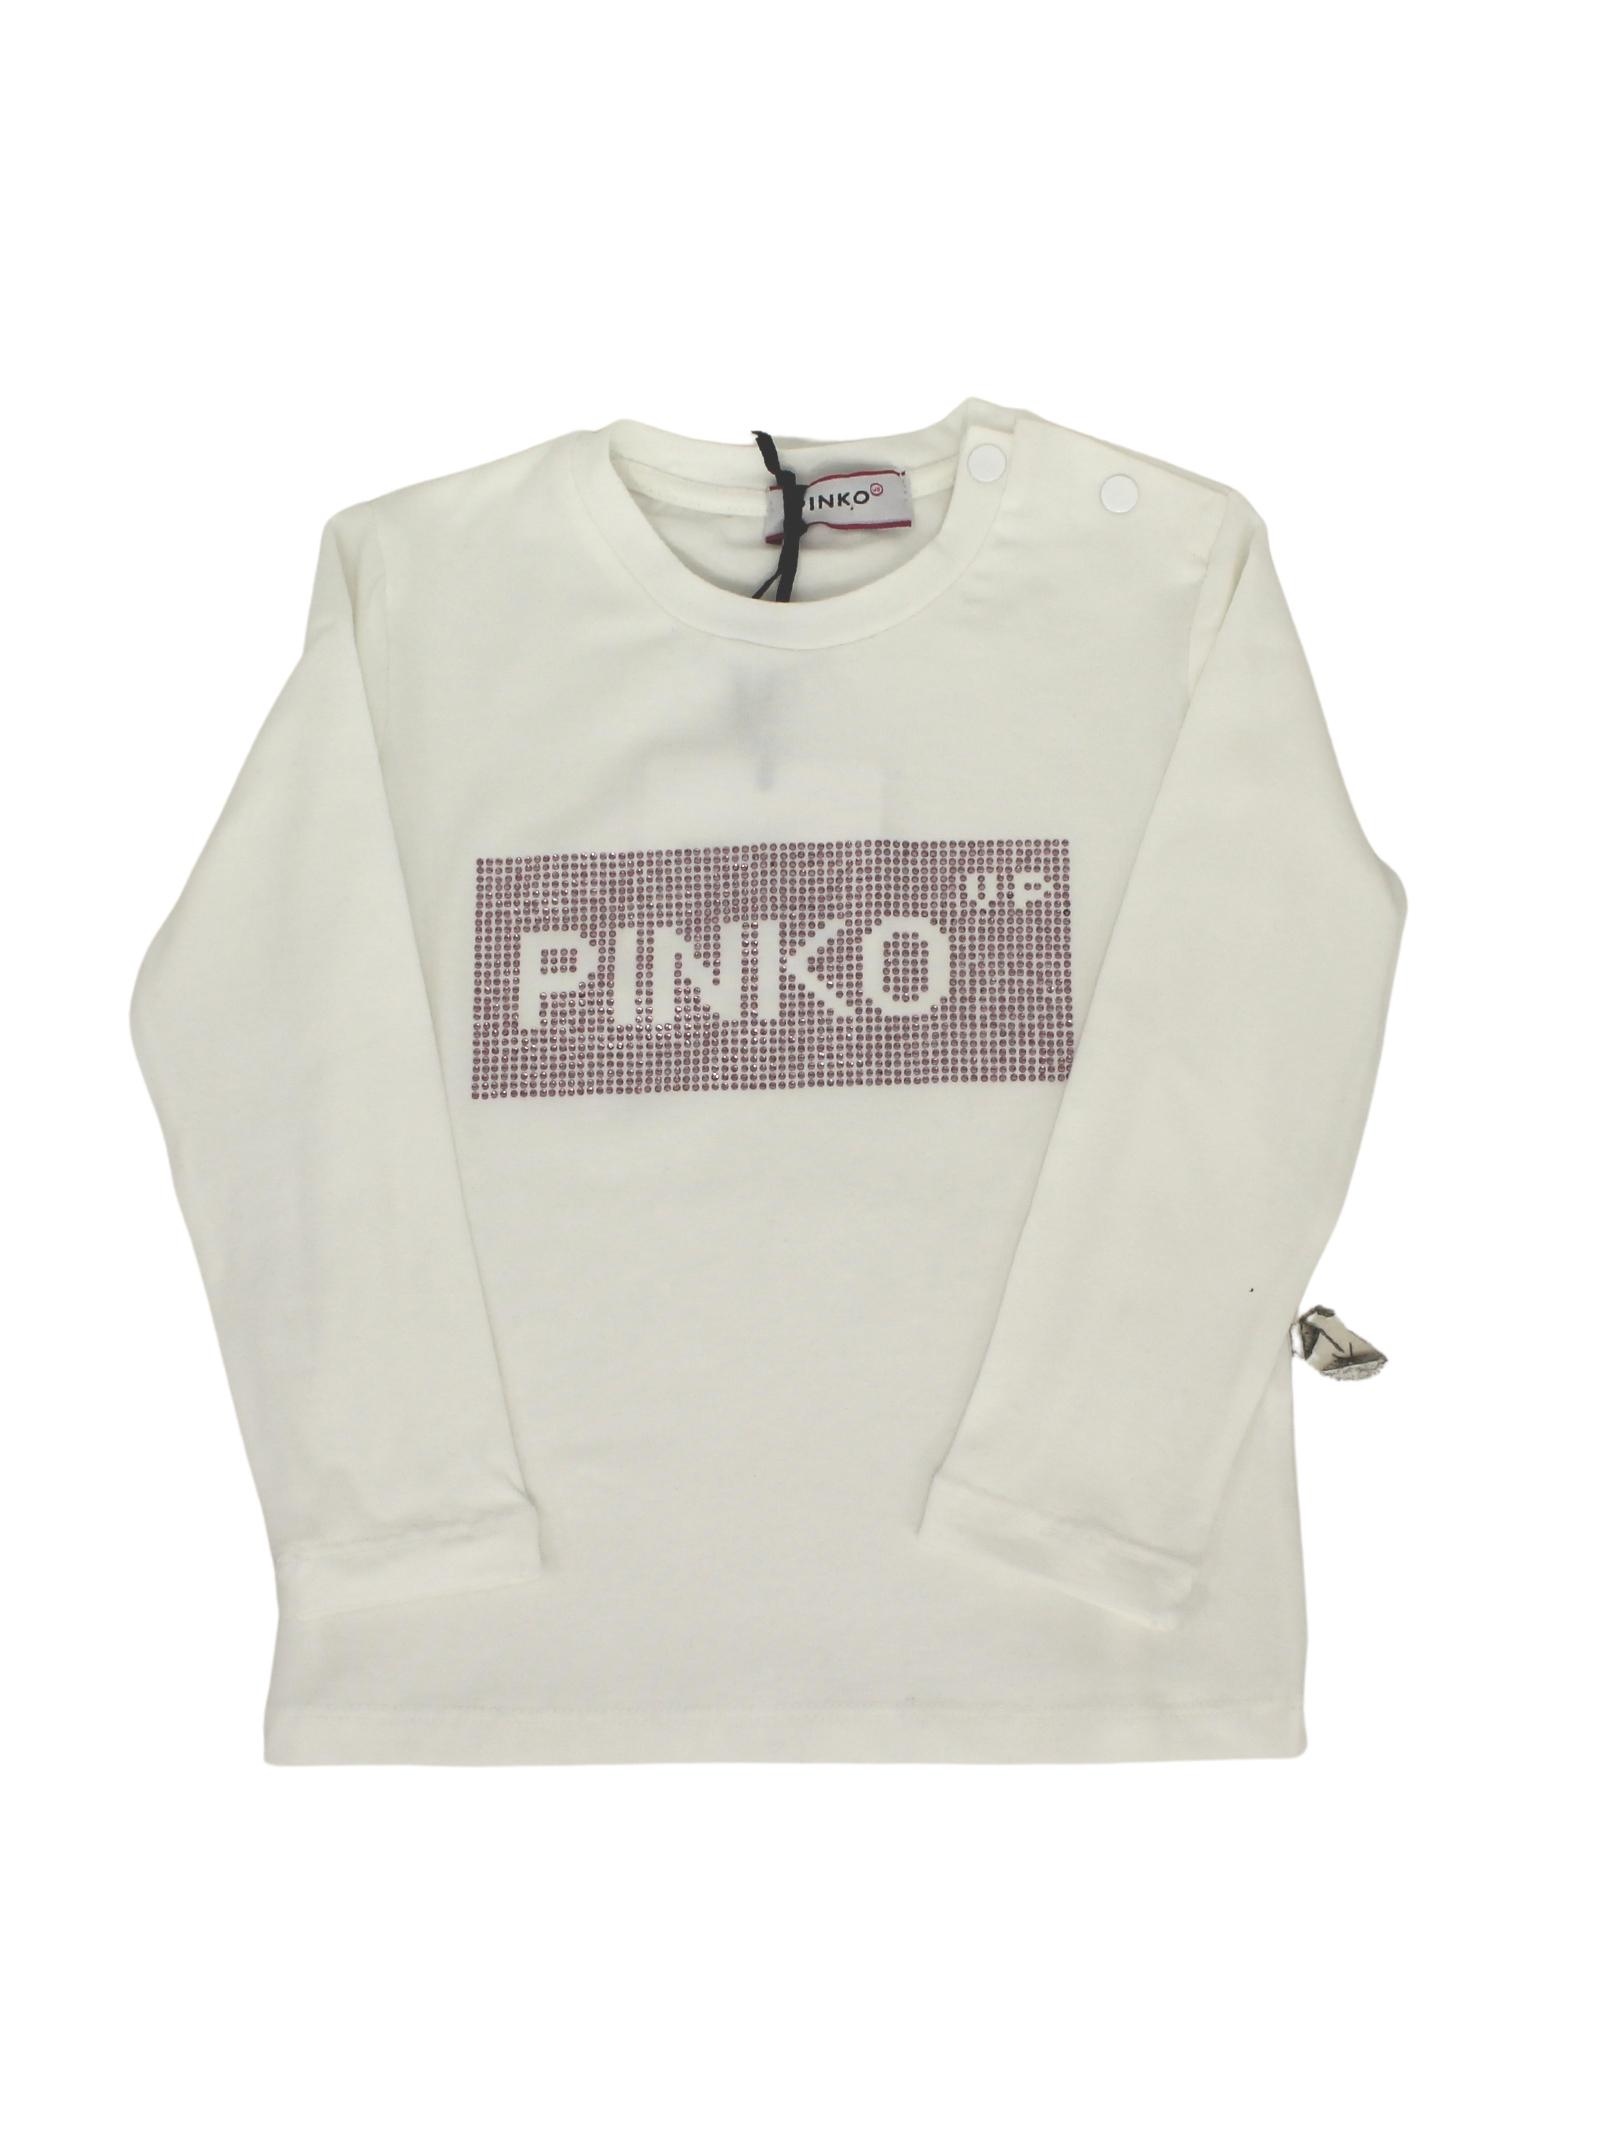 T-shirt White Logo Brillantini Bambina PINKO UP | T-shirt | 028737002.